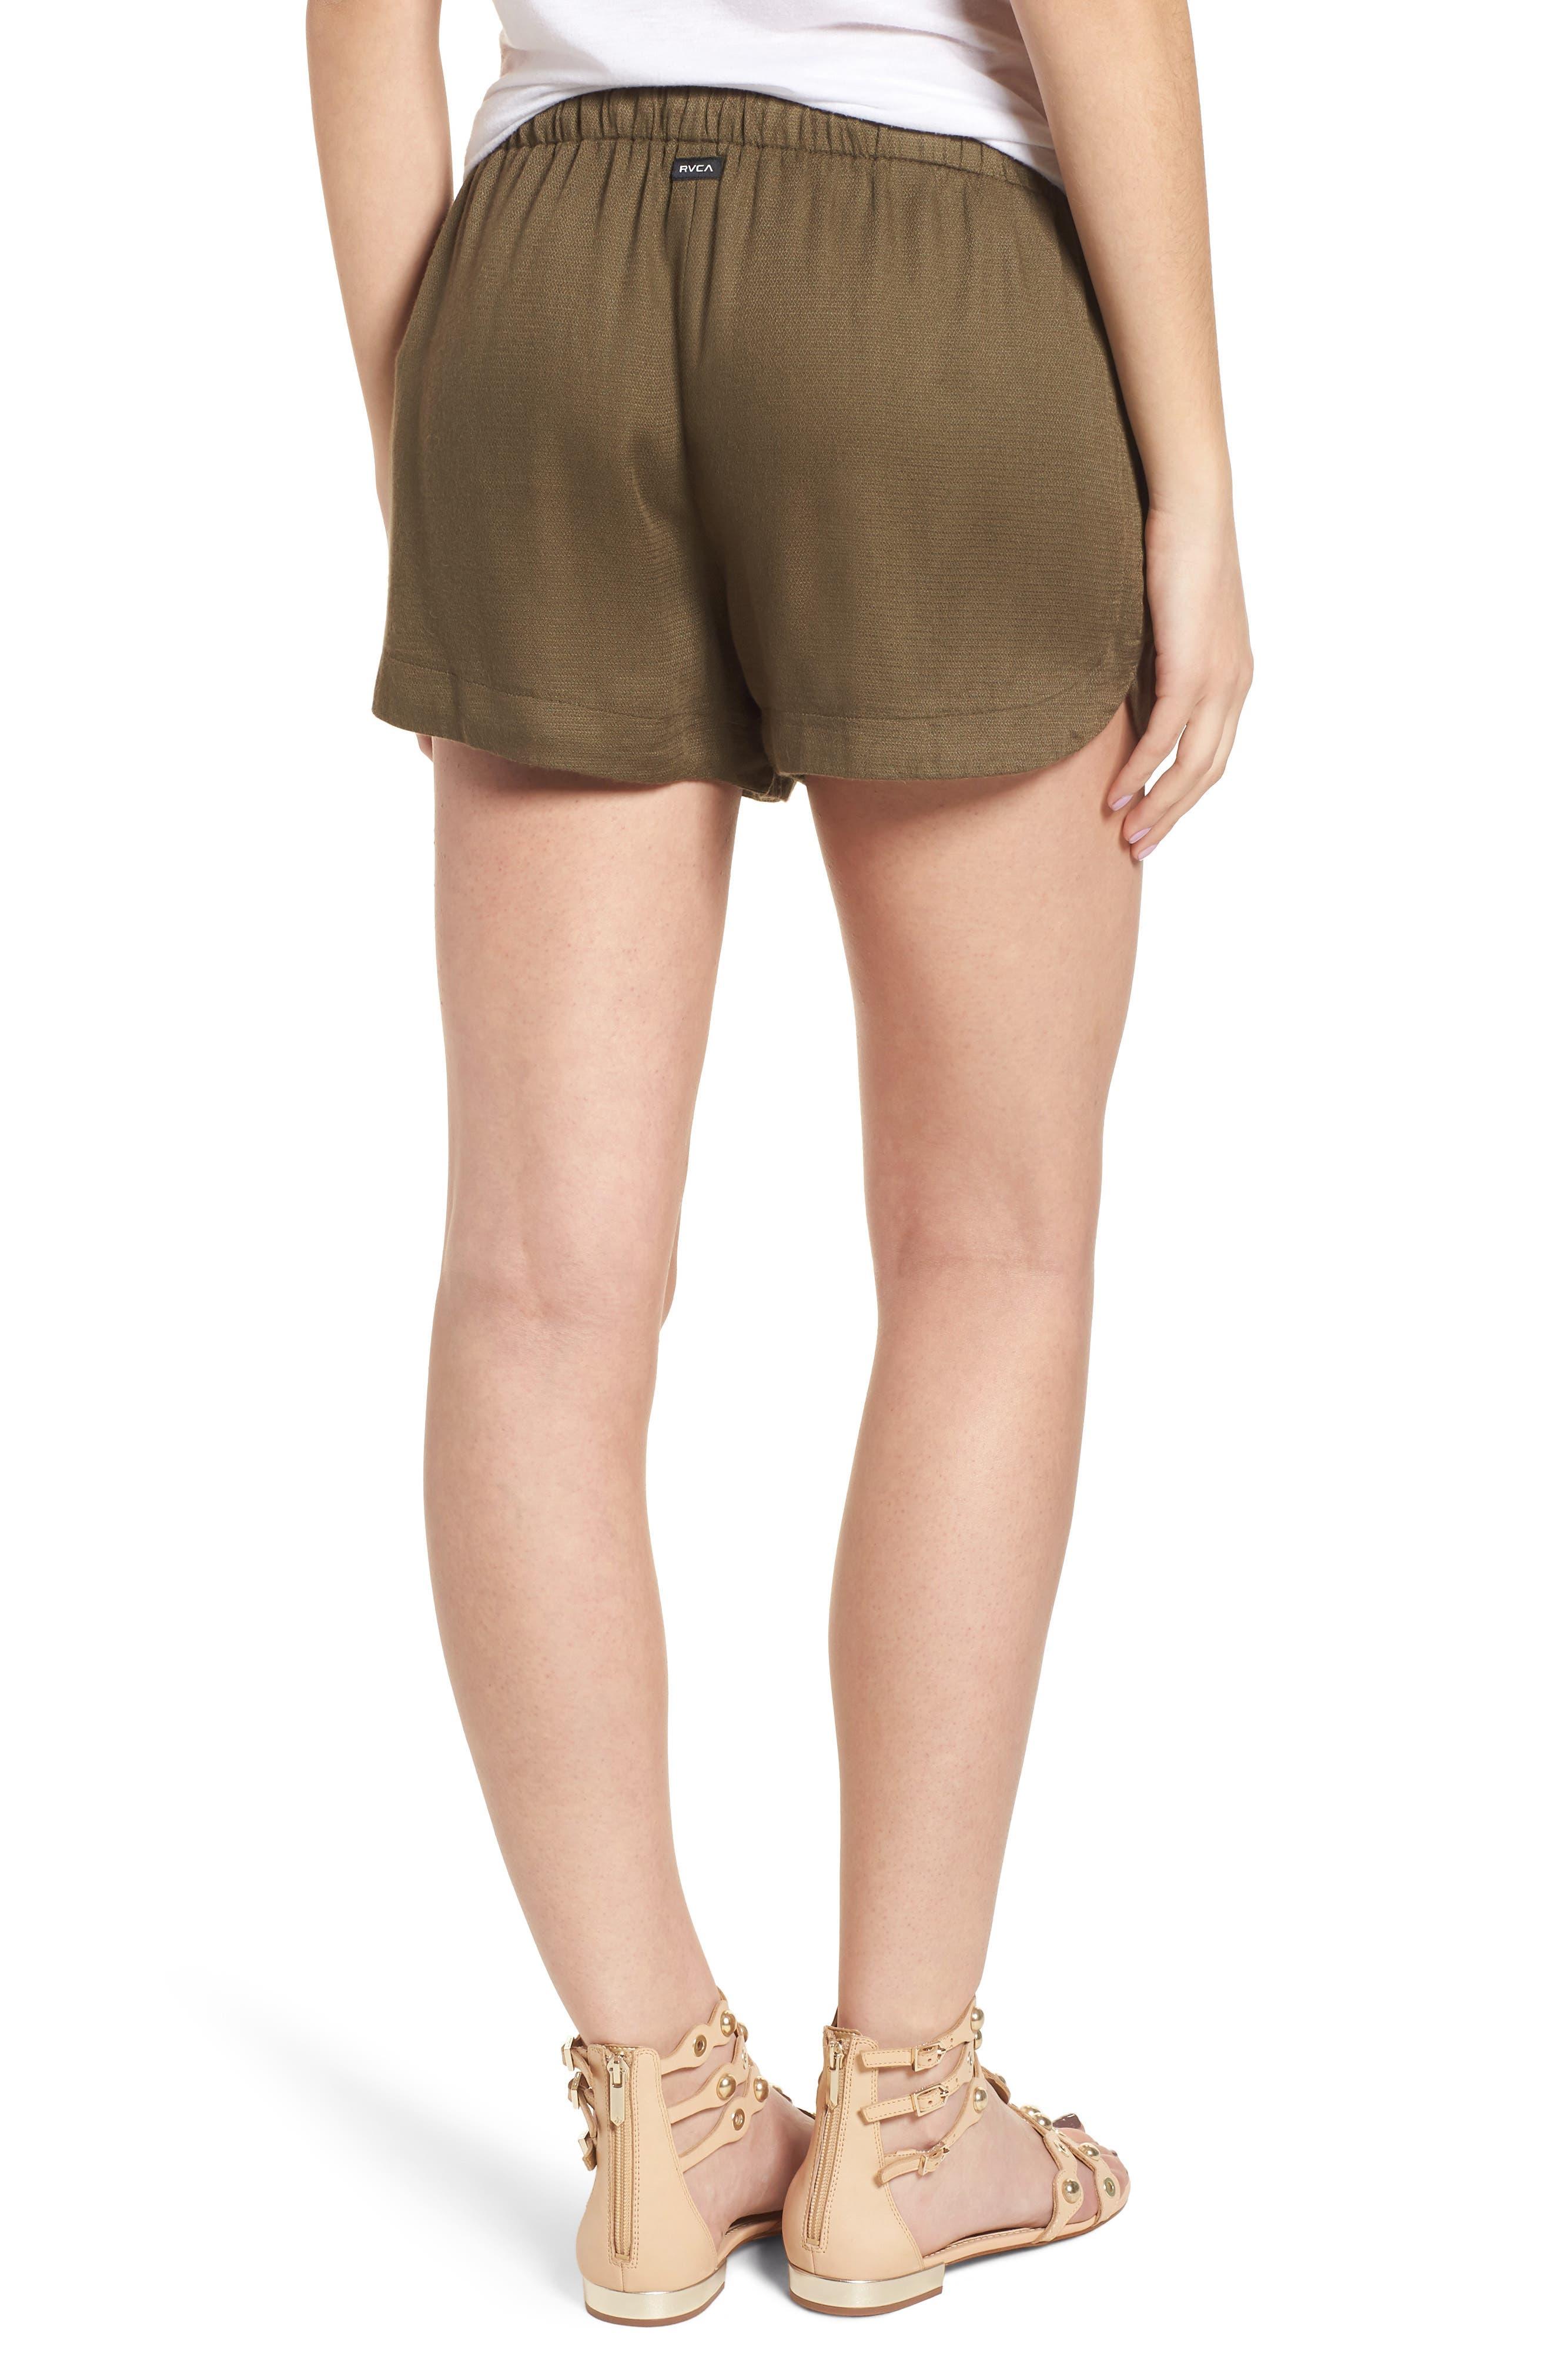 Vary Yume Shorts,                             Alternate thumbnail 2, color,                             Burnt Olive